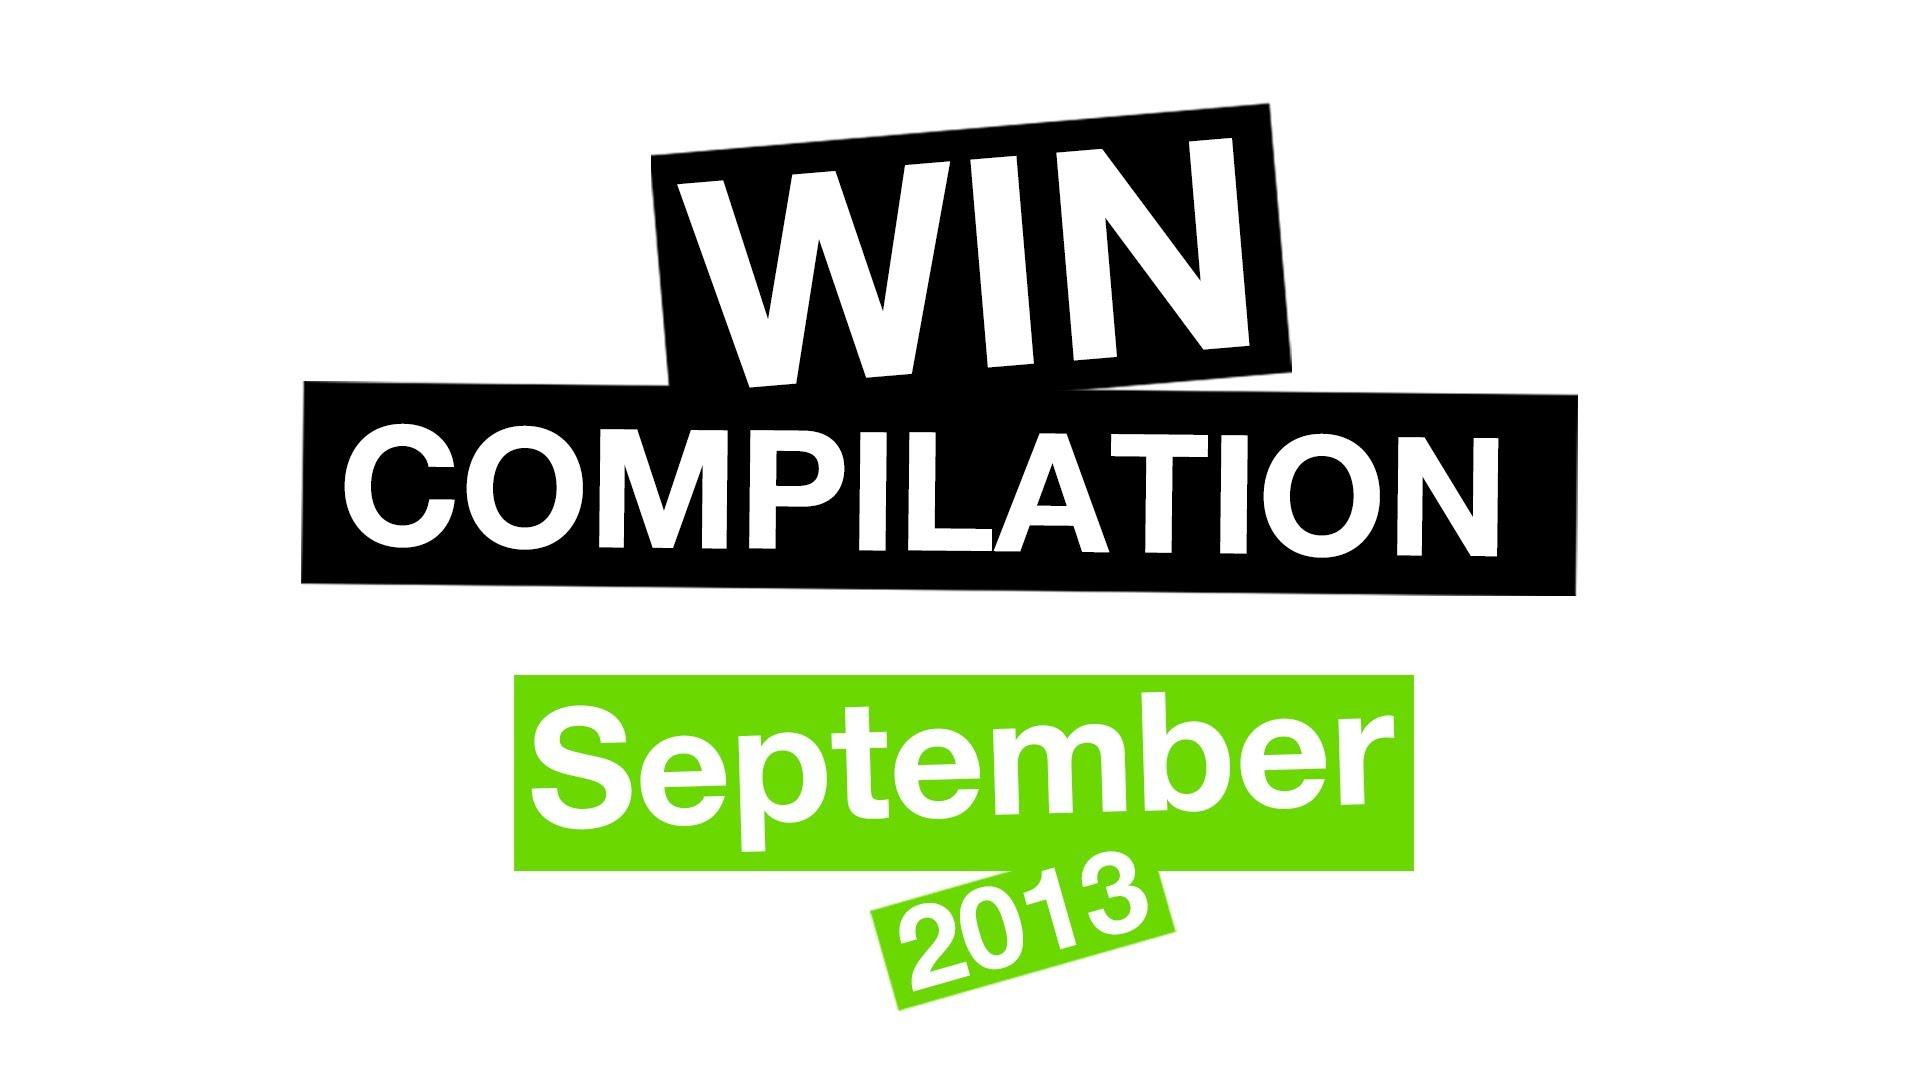 WIN Compilation September 2013